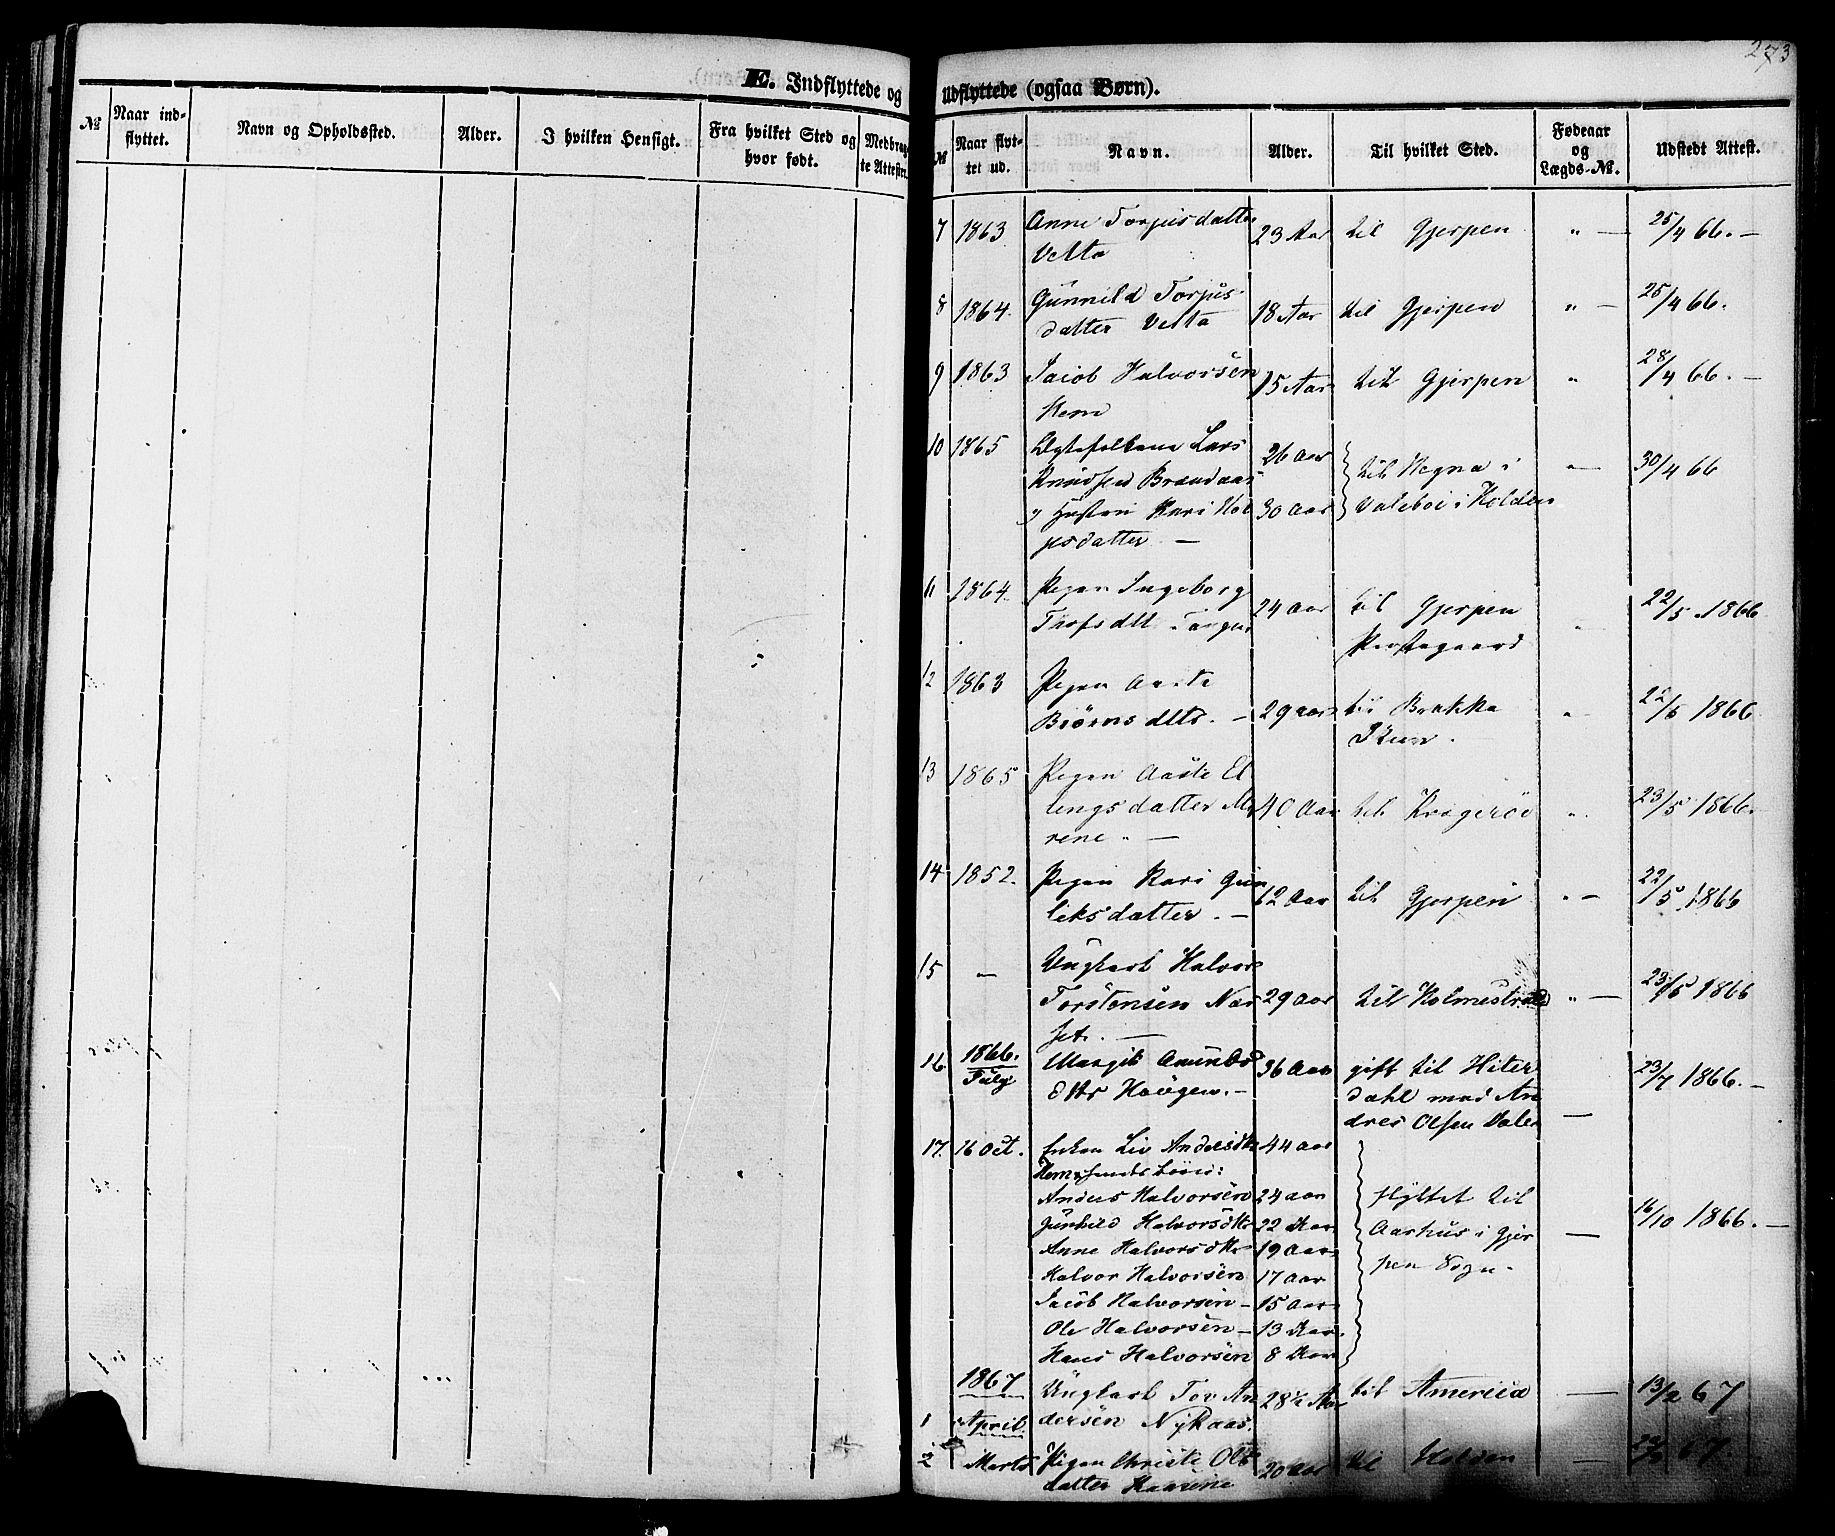 SAKO, Sauherad kirkebøker, F/Fa/L0007: Ministerialbok nr. I 7, 1851-1873, s. 273